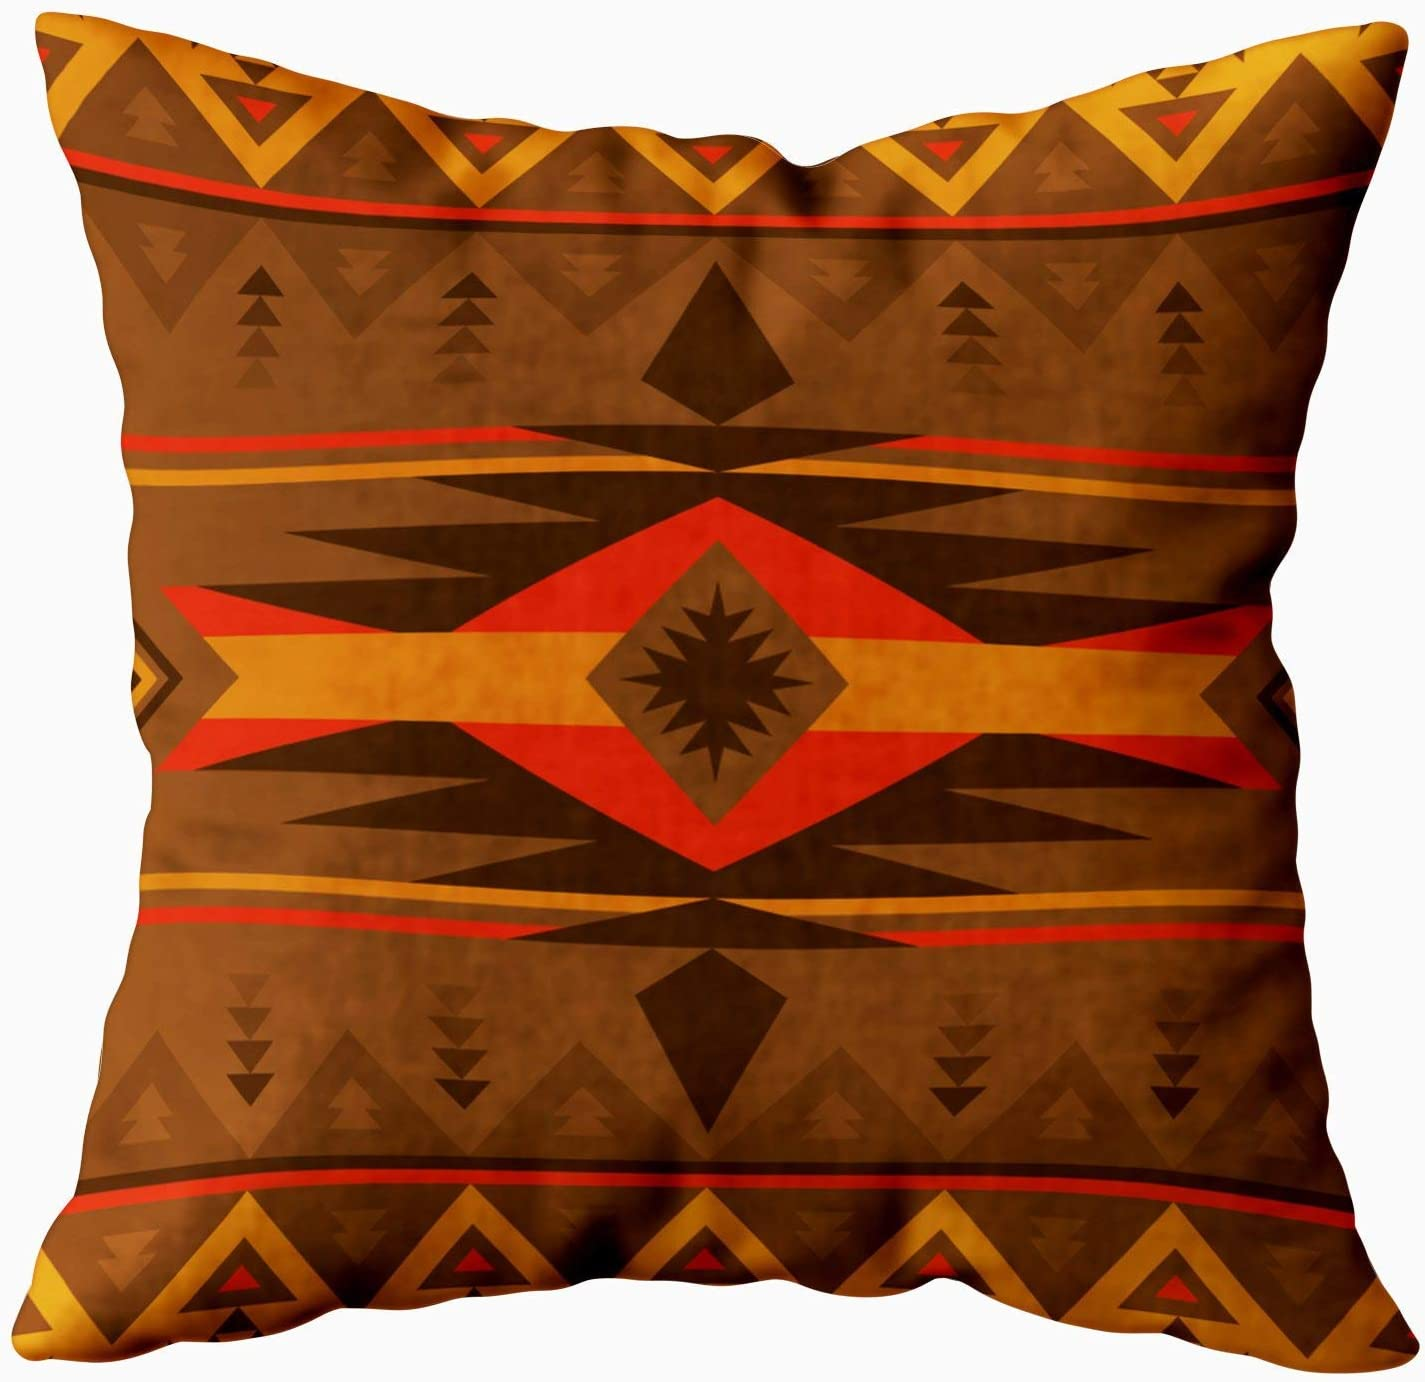 Regular dealer Jbralid Pillow Case Throw Popular C Size Bargain Sofa